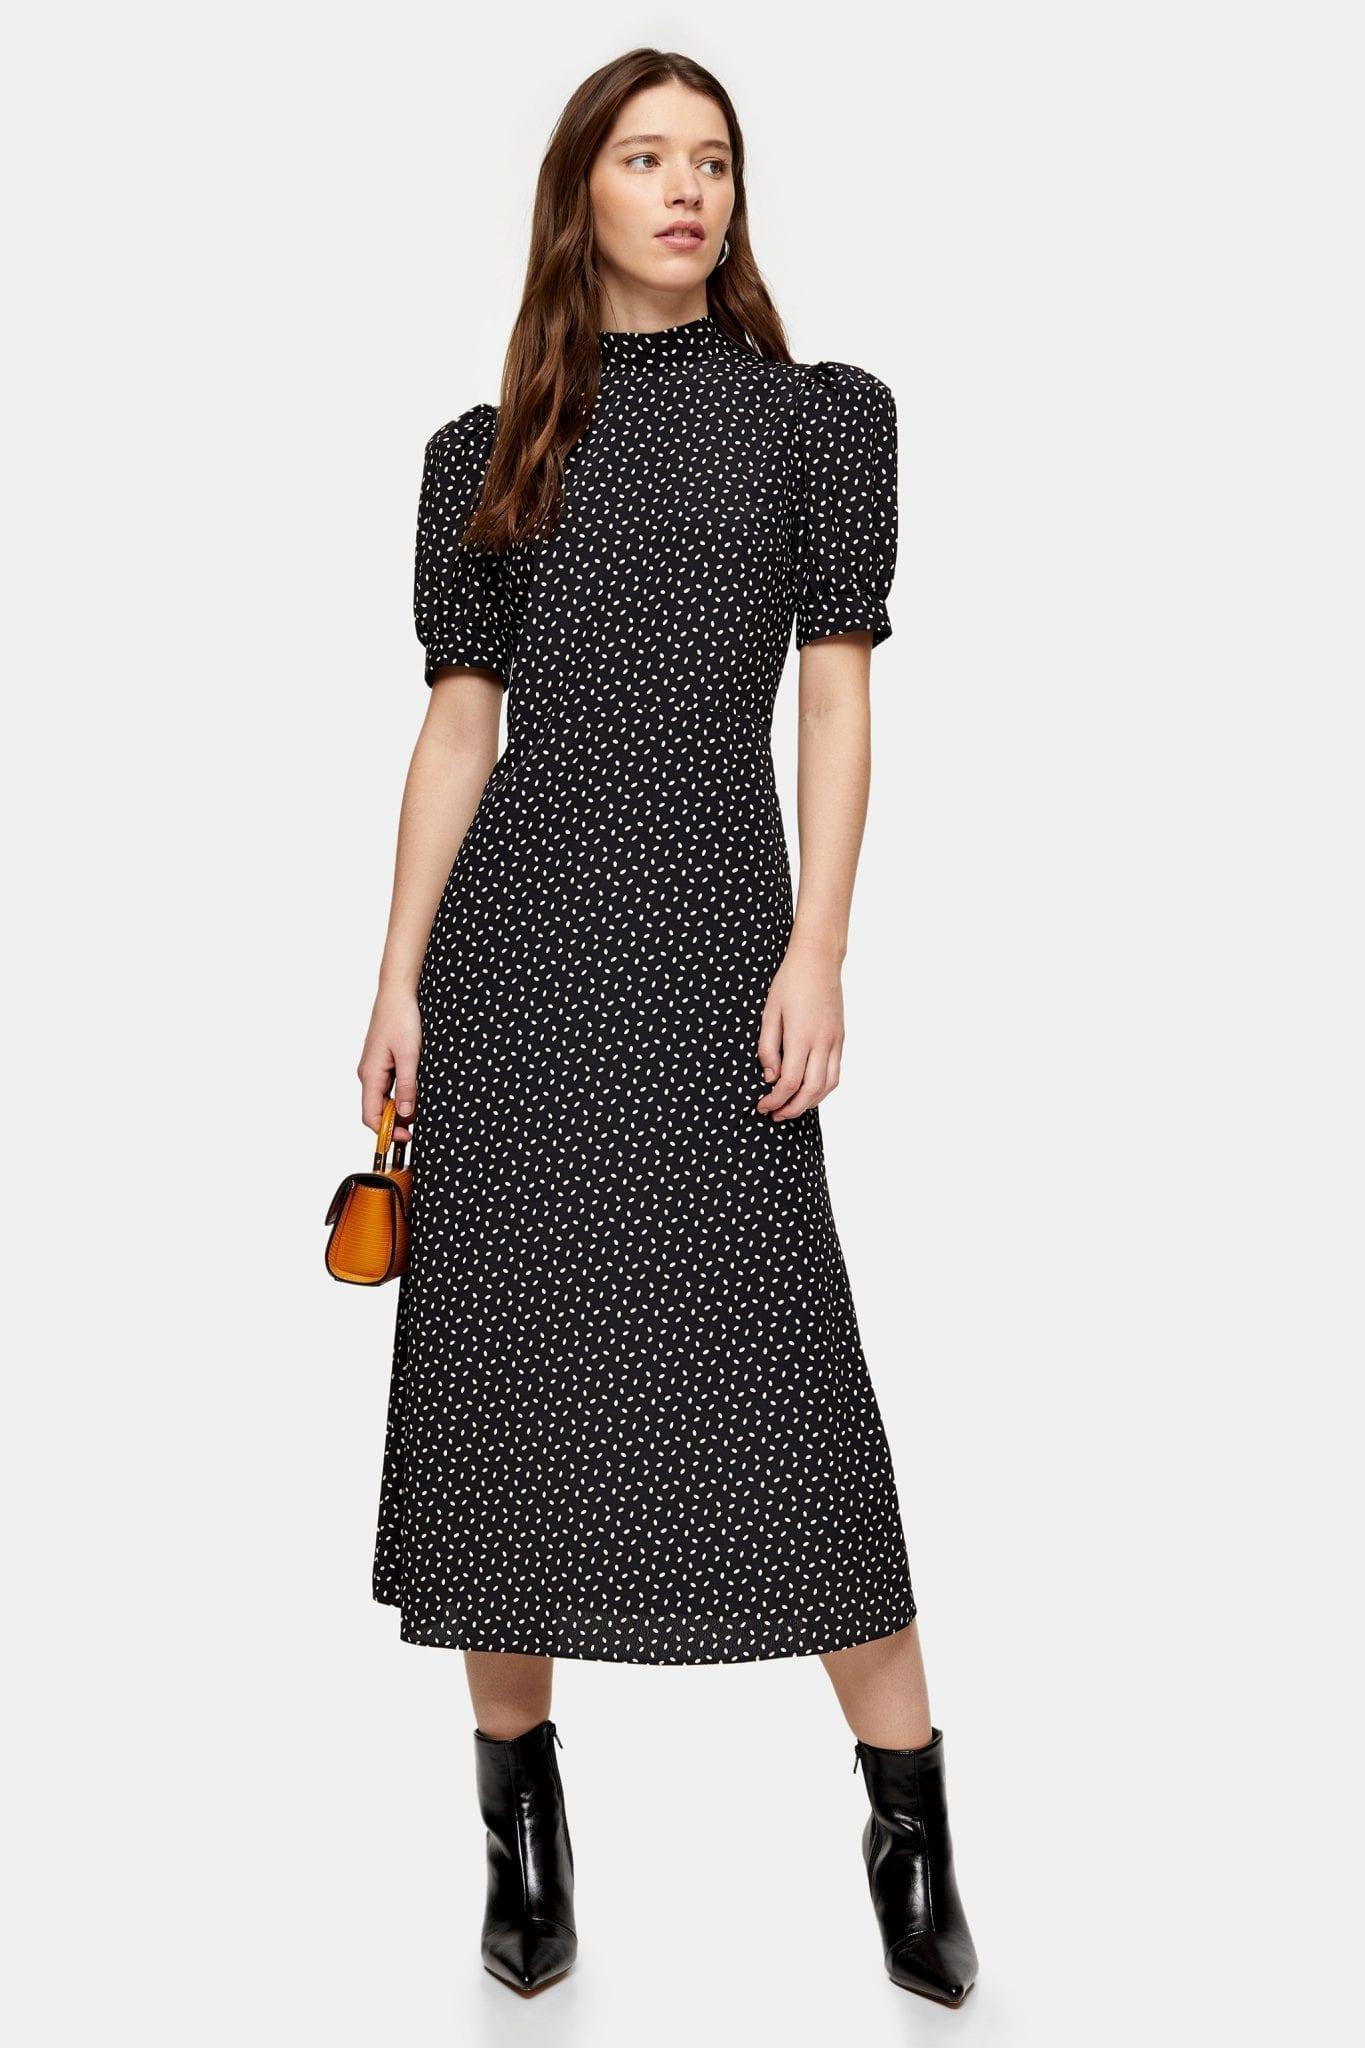 TOPSHOP Black And White Spot Tea Dress